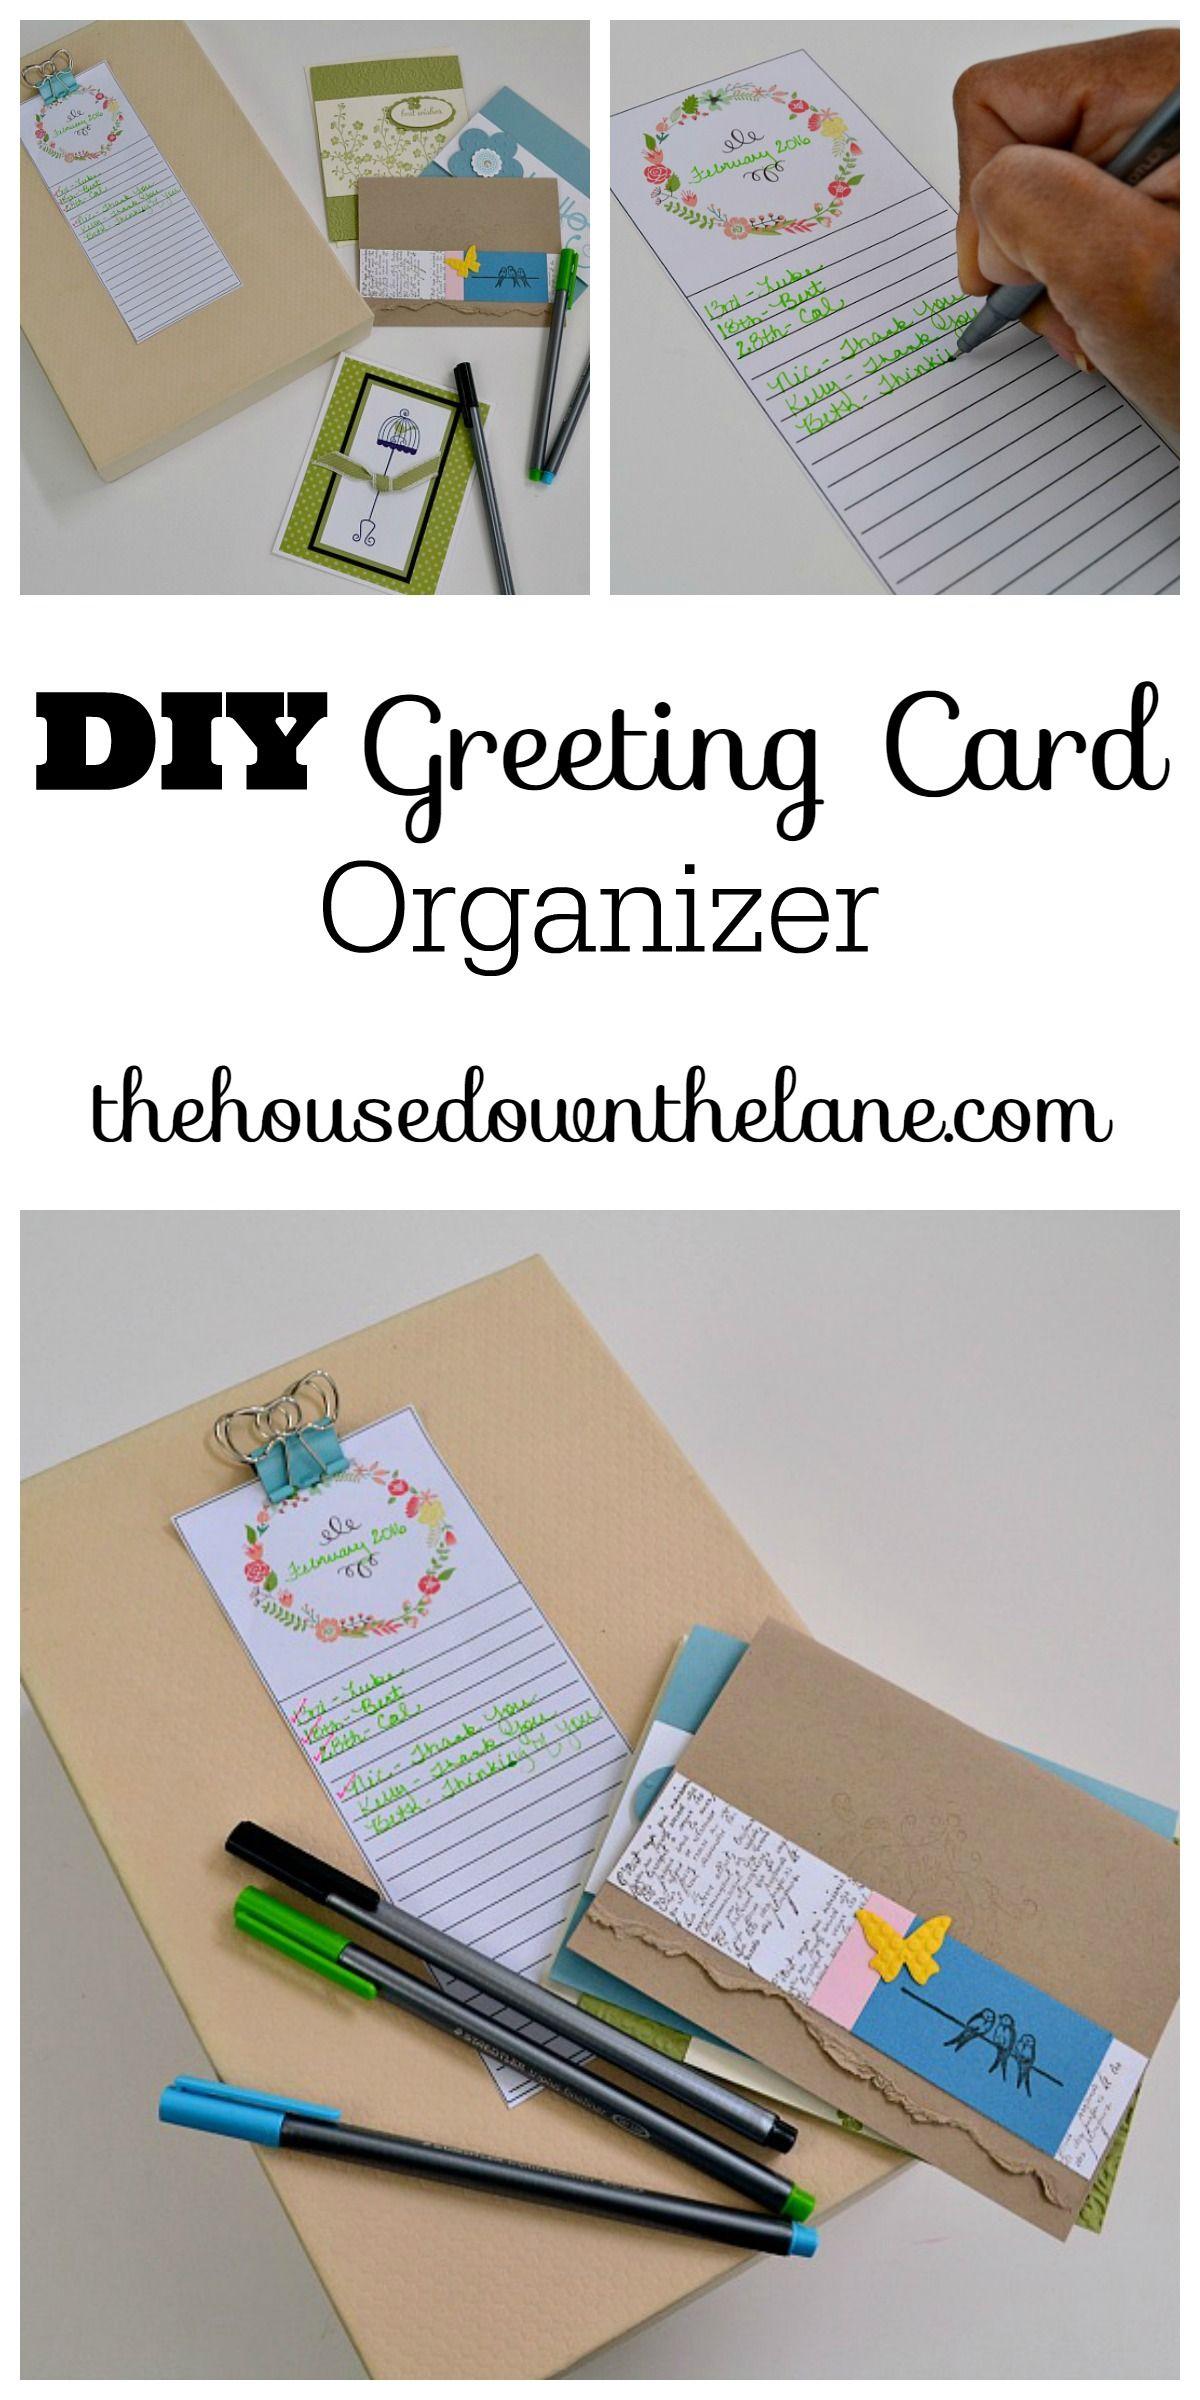 Diy Greeting Card Organizer Calyx Corolla Greeting Cards Diy Greeting Card Organizer Card Organizer